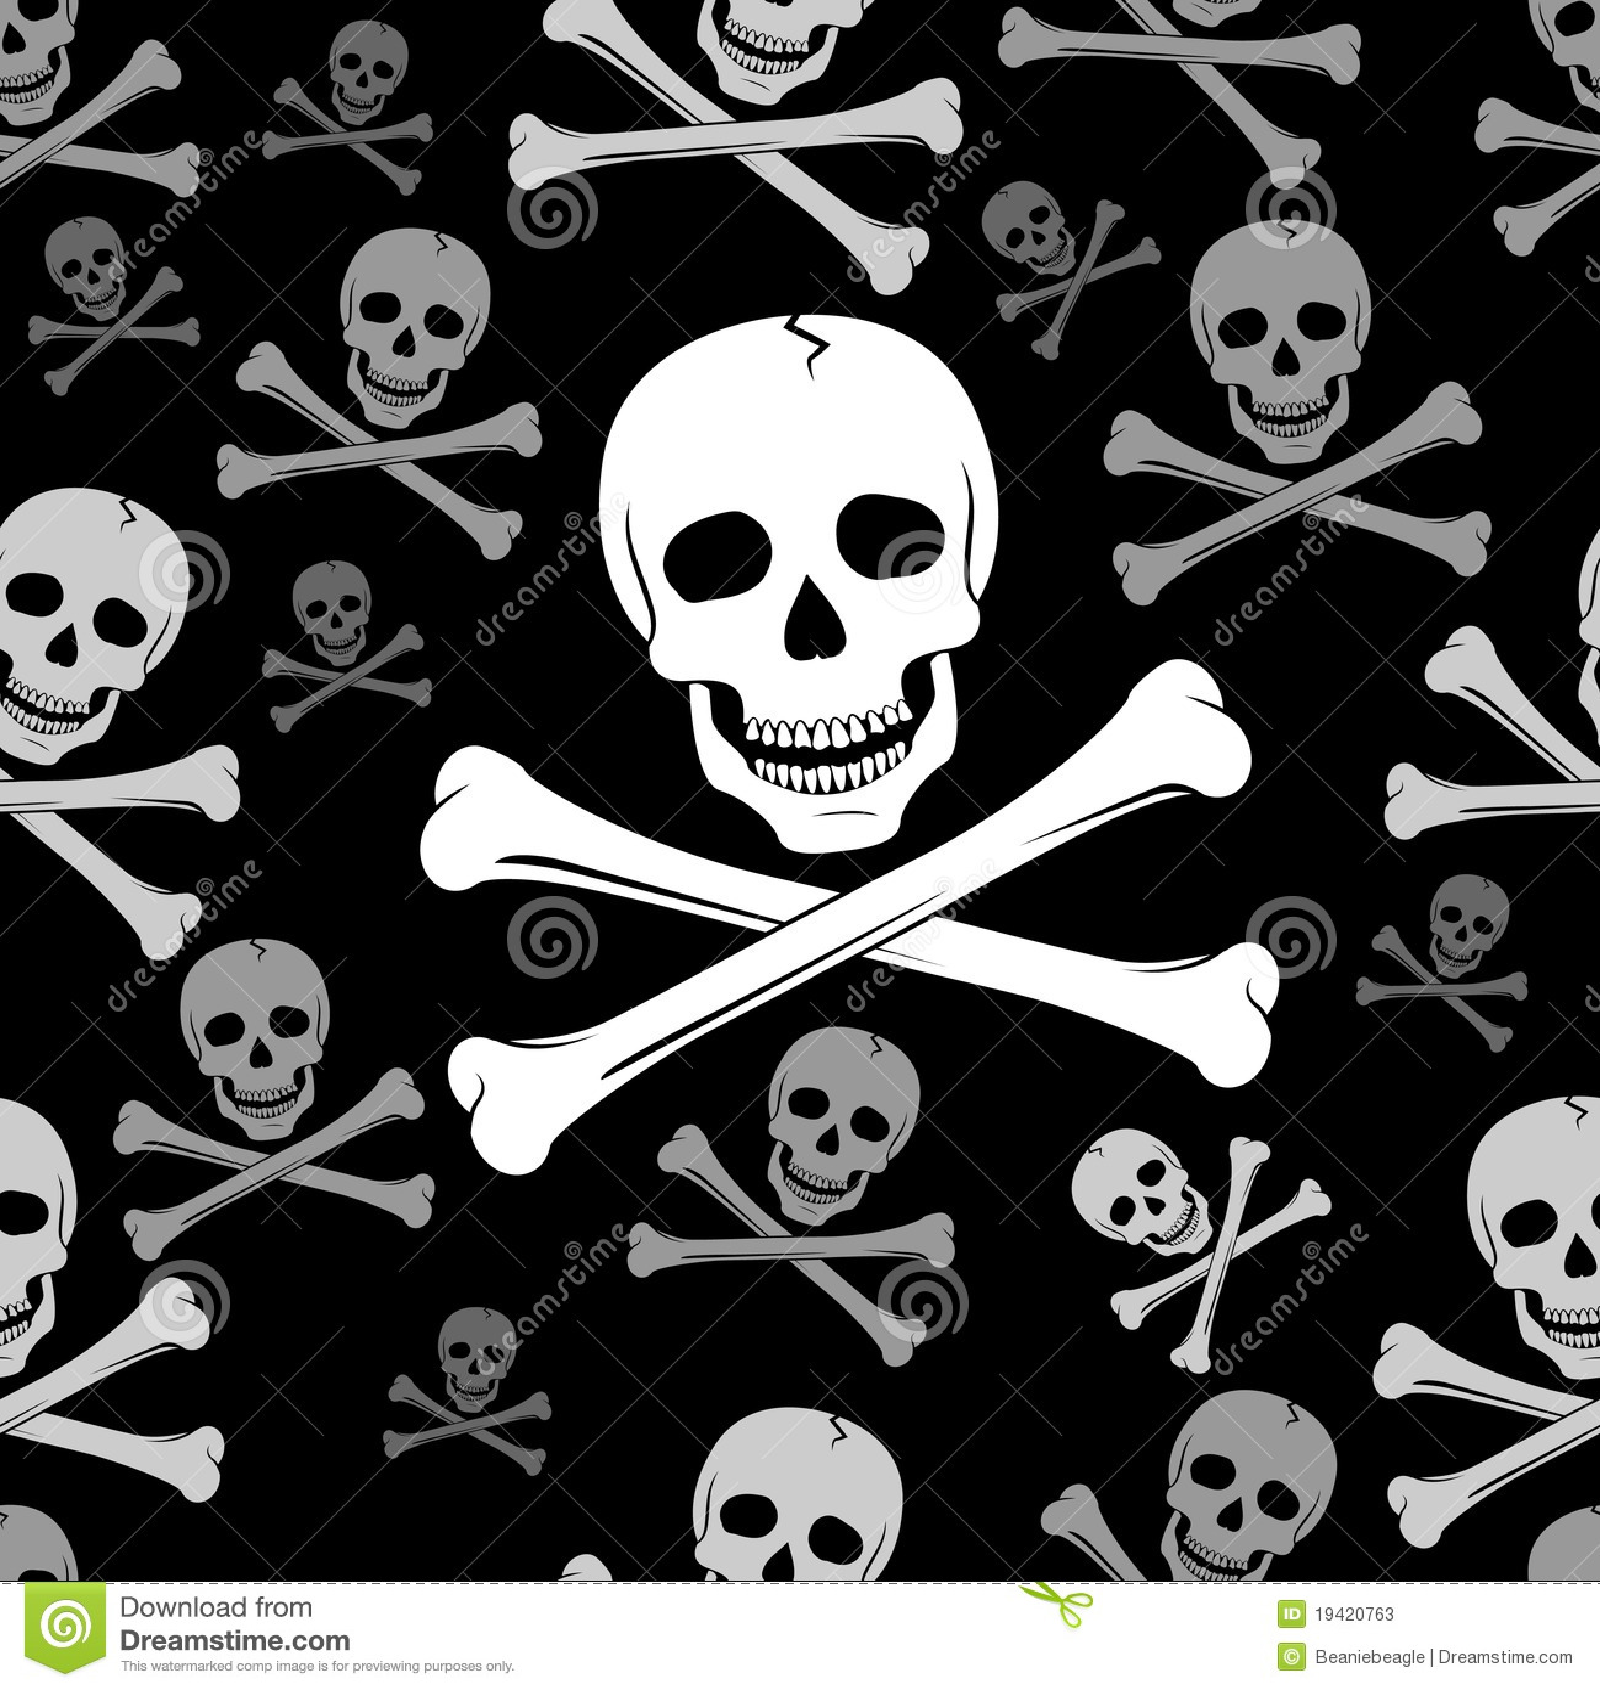 skull and crossbones pattern stock photos image 19420763